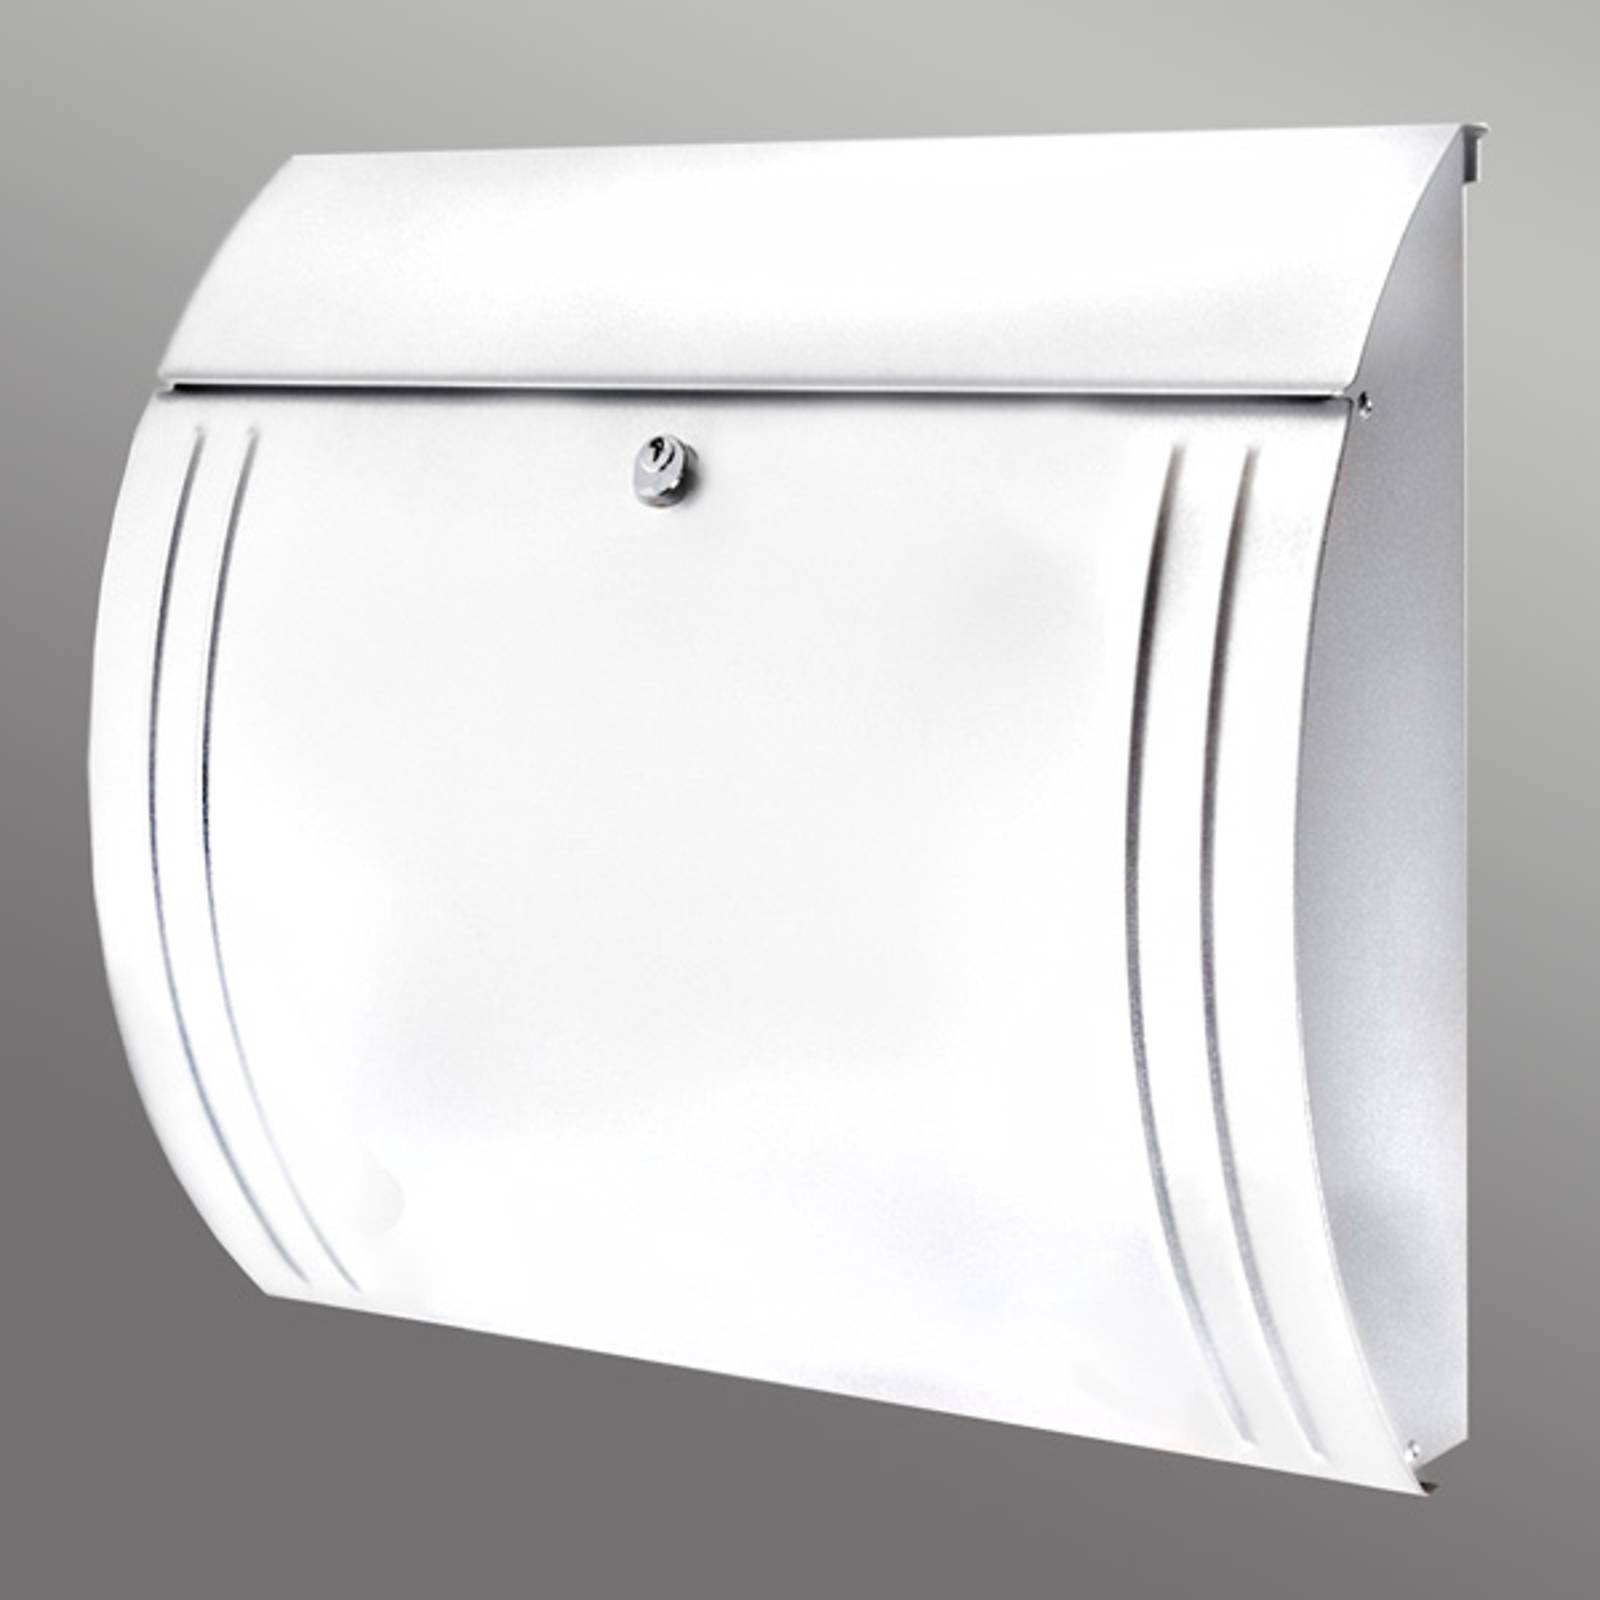 Modena steel letter box, beautiful shape, white